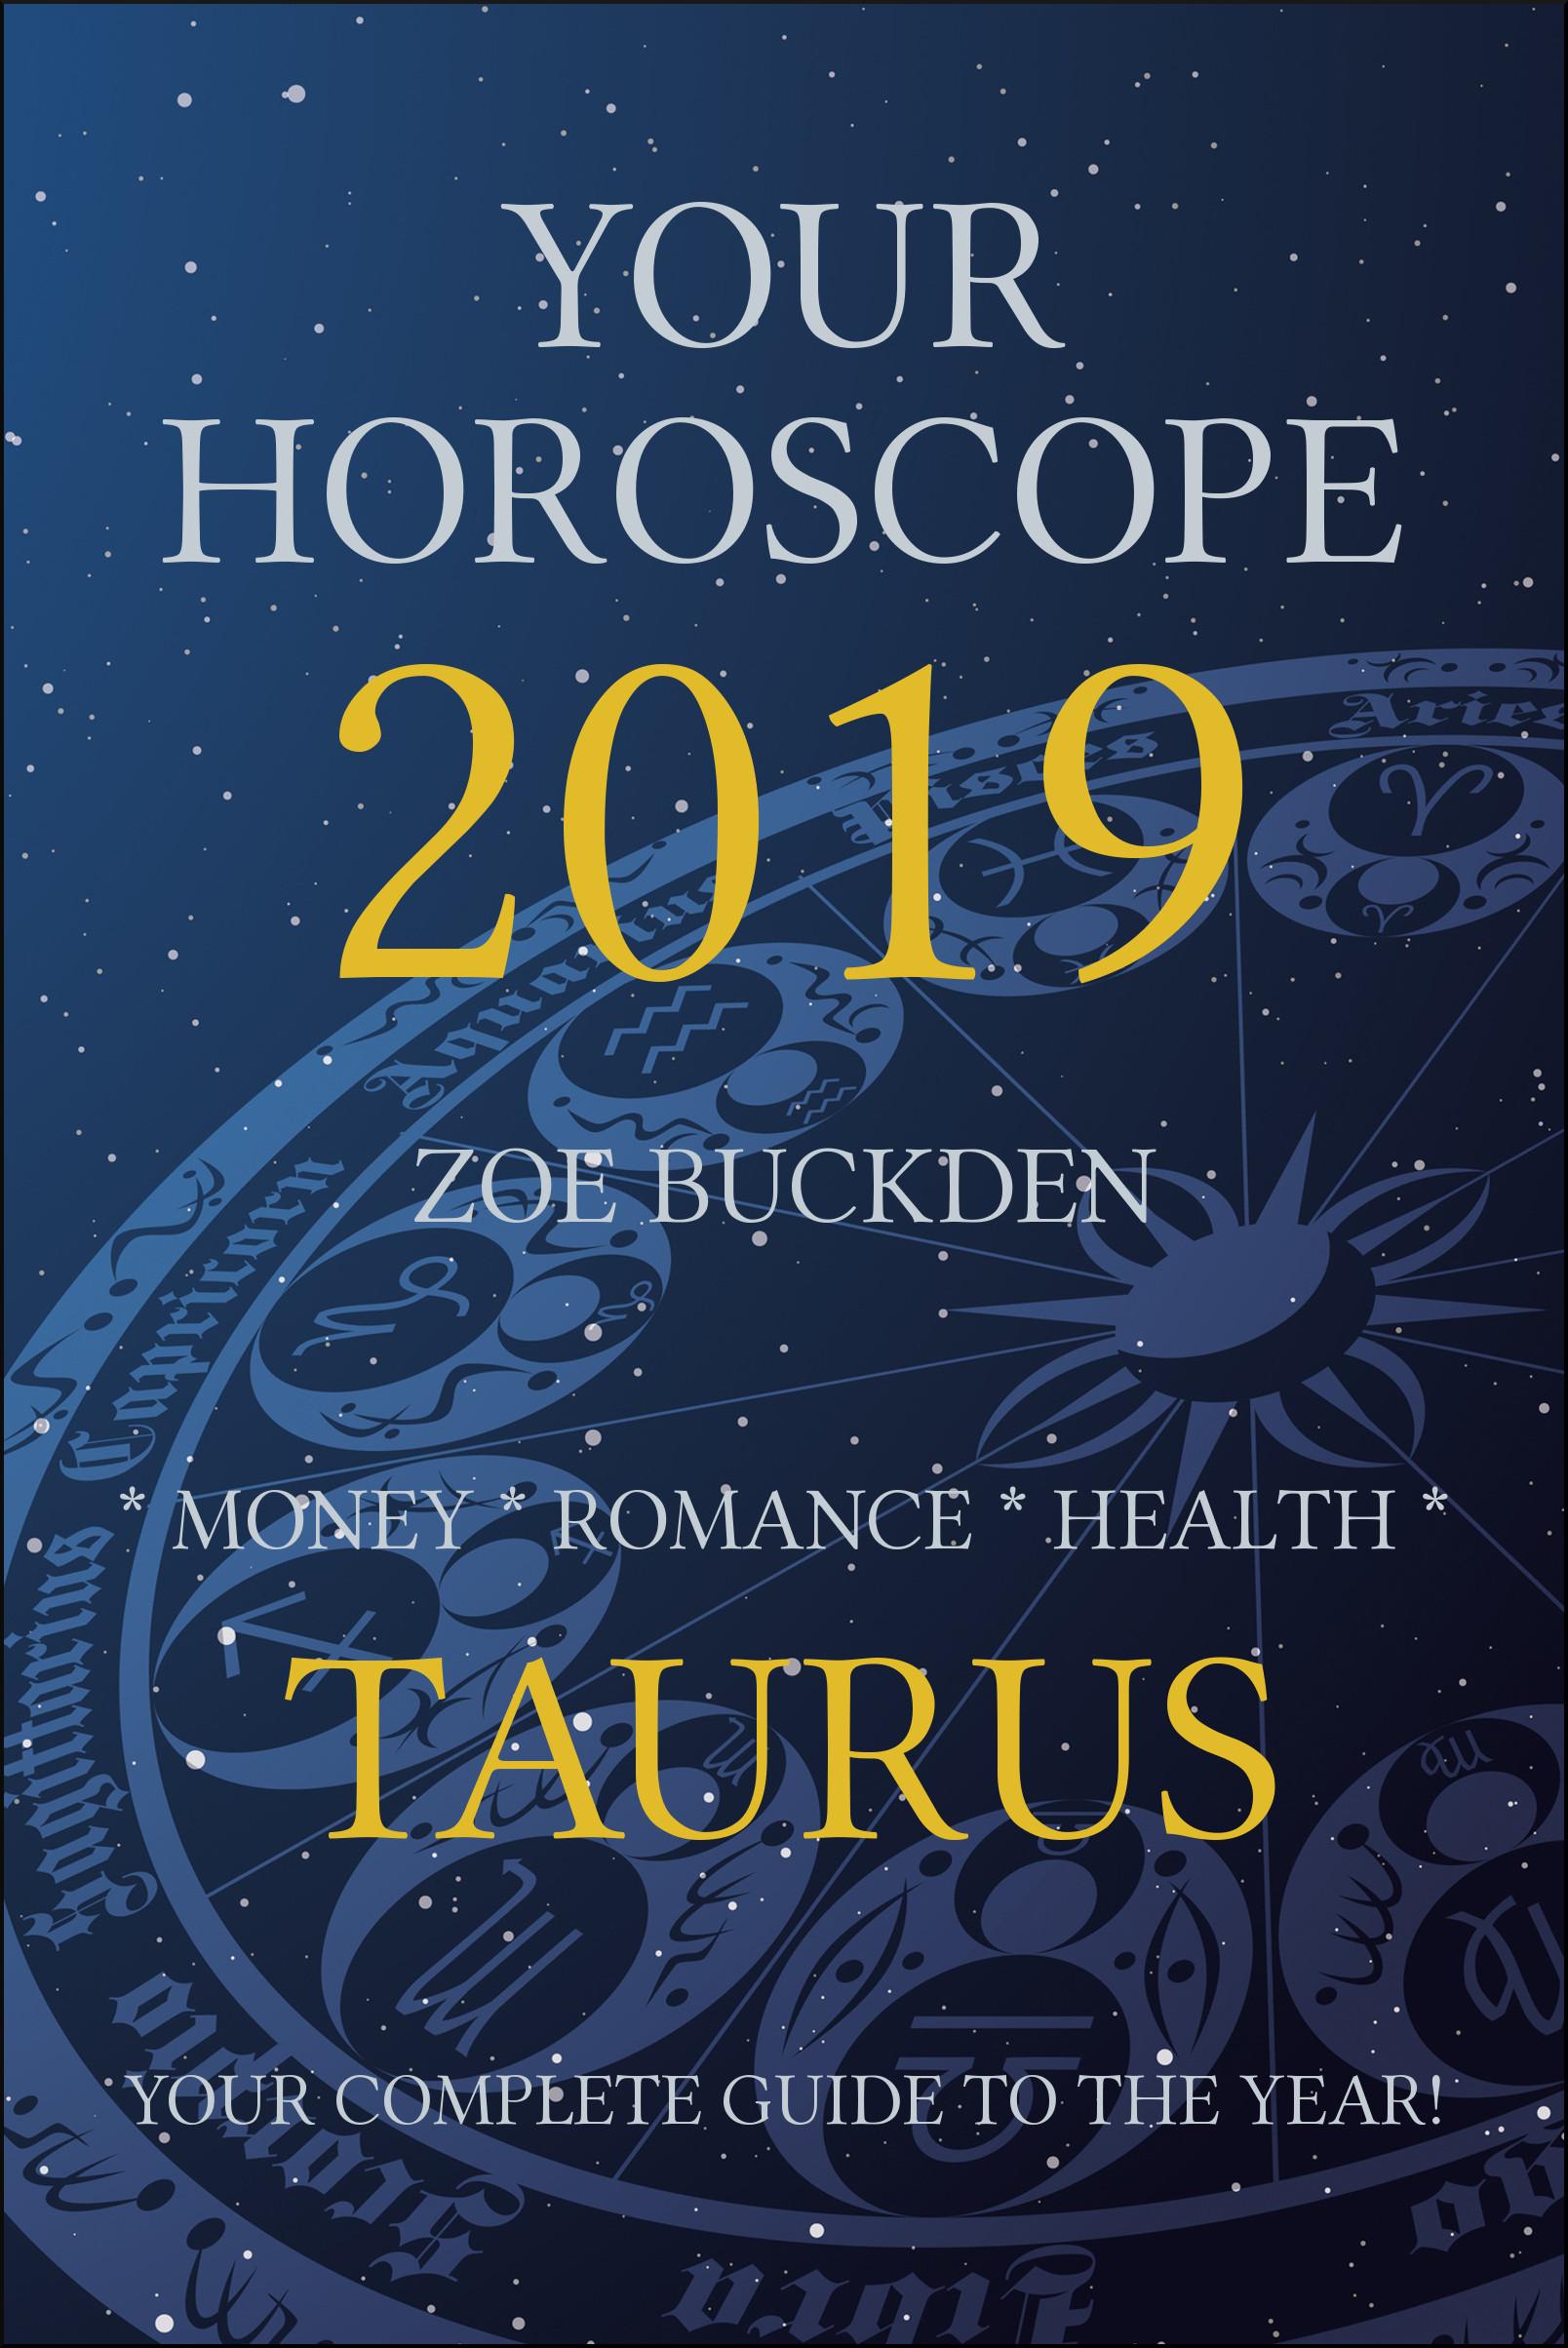 Your Horoscope 2019: Taurus, an Ebook by Zoe Buckden